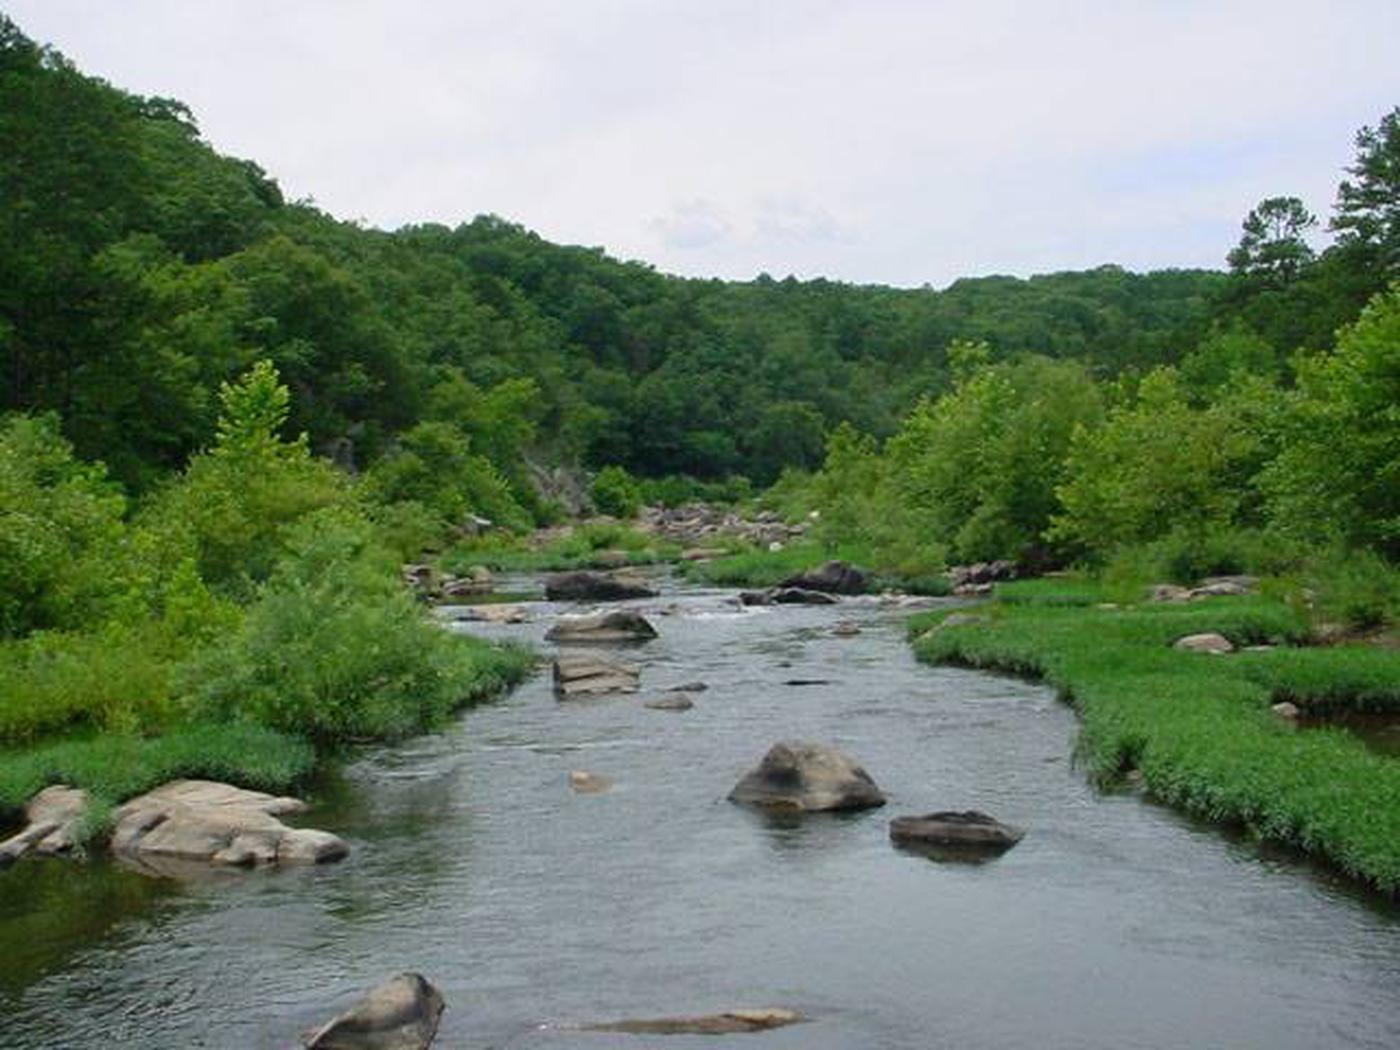 St Francis RiverSt. Francis River